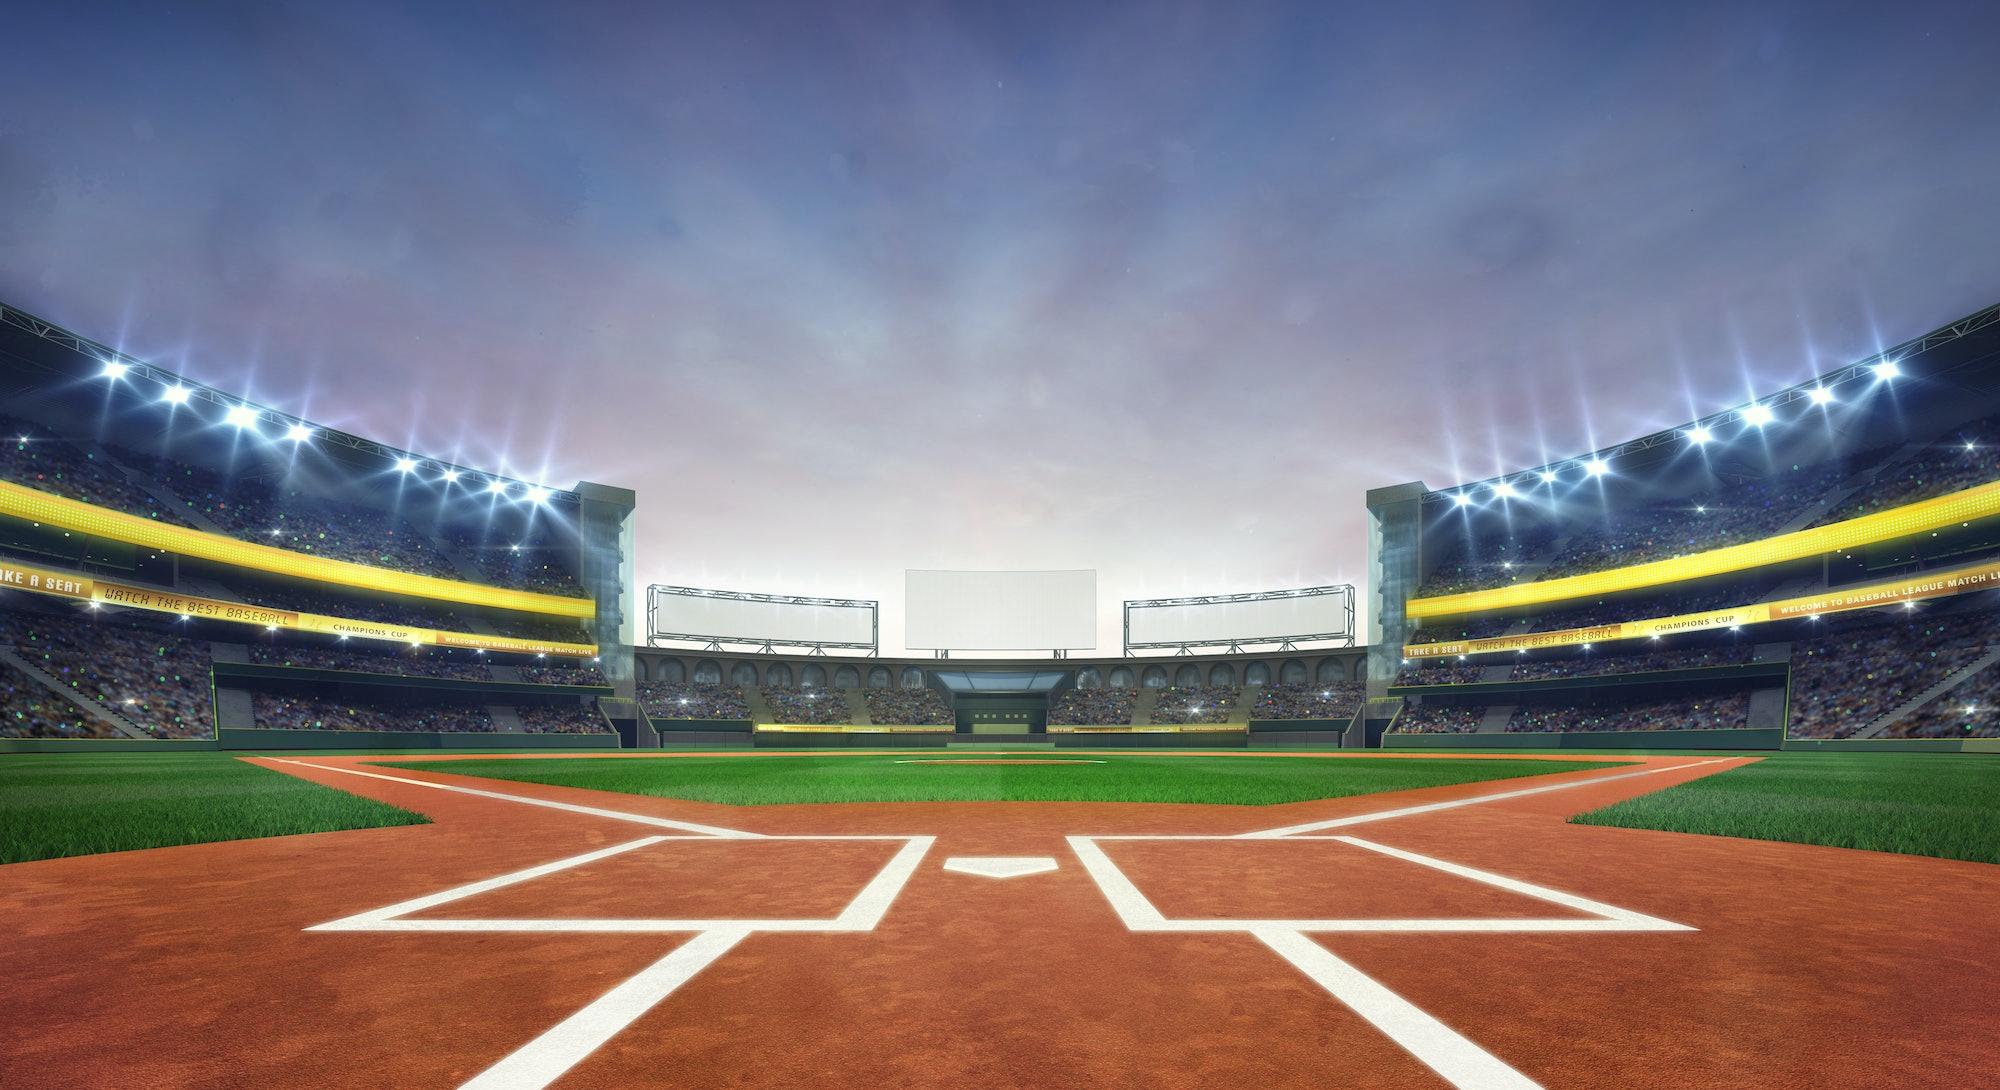 grand baseball stadium field diamond daylight view, modern public sport building 3D render background